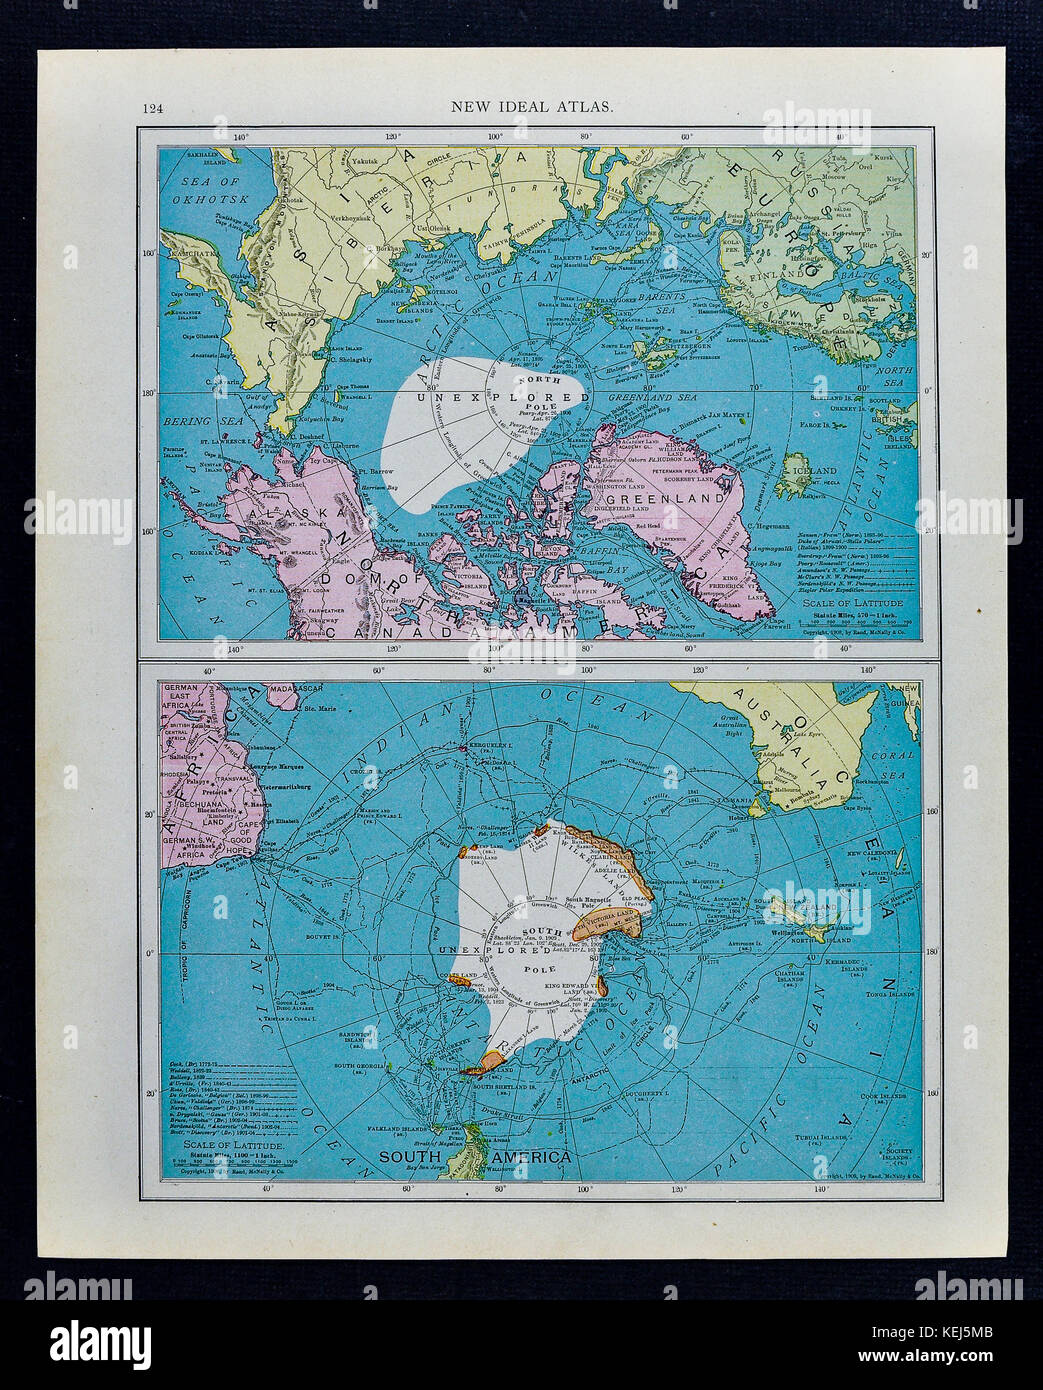 McNally Antique Map 1911 - South Pole Antarctica & North Pole Arctic Ocean - Stock Image